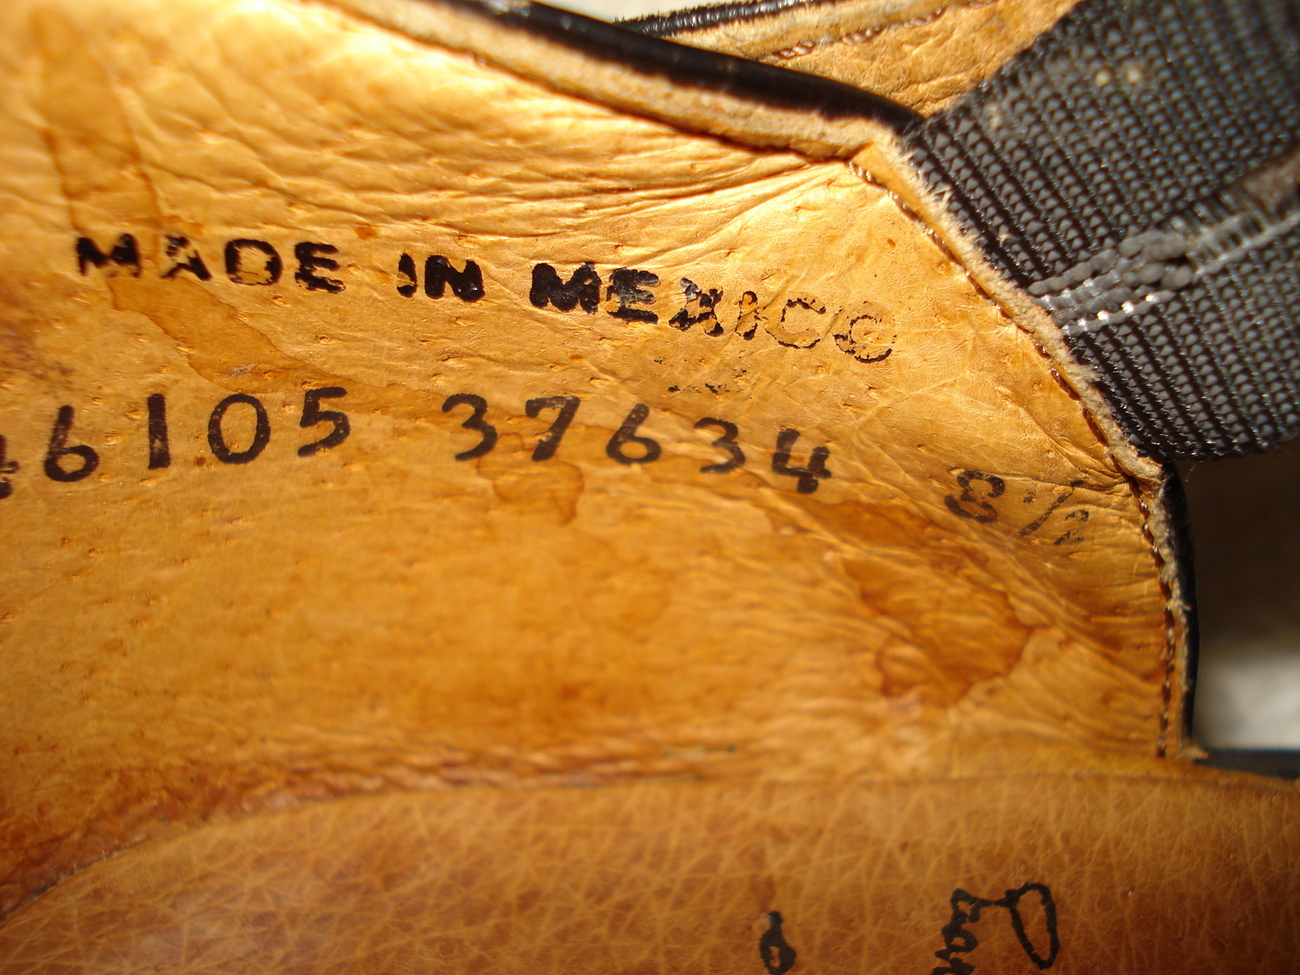 John Fluevog Black Leather Platform Mary Janes Size 8.5 Made in Mexico